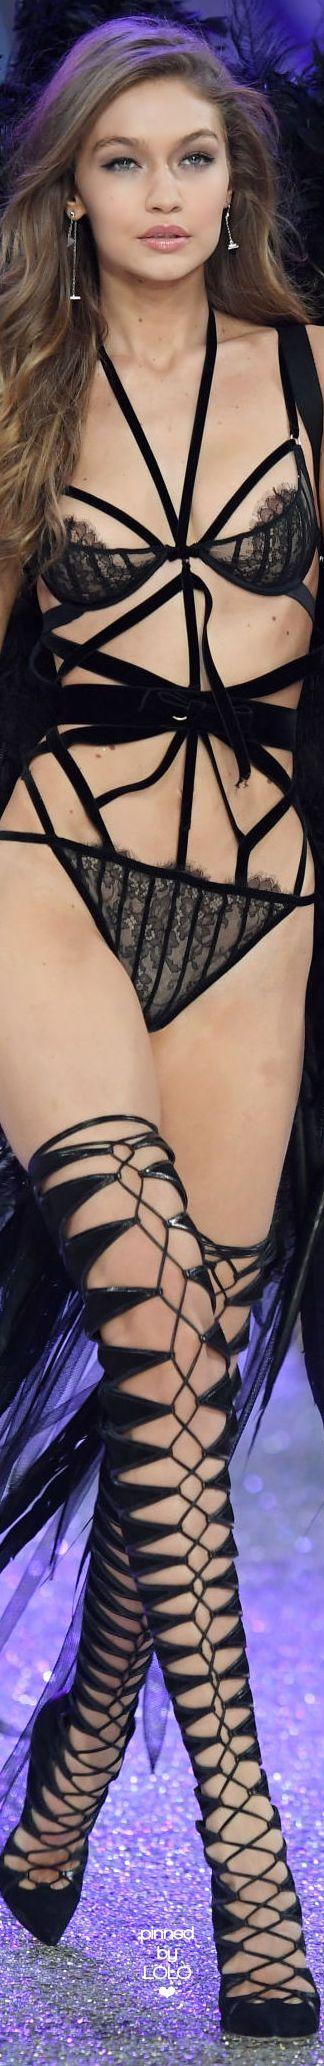 Gigi Hadid 2016 Victoria Secret Fashion Show | LOLO❤︎